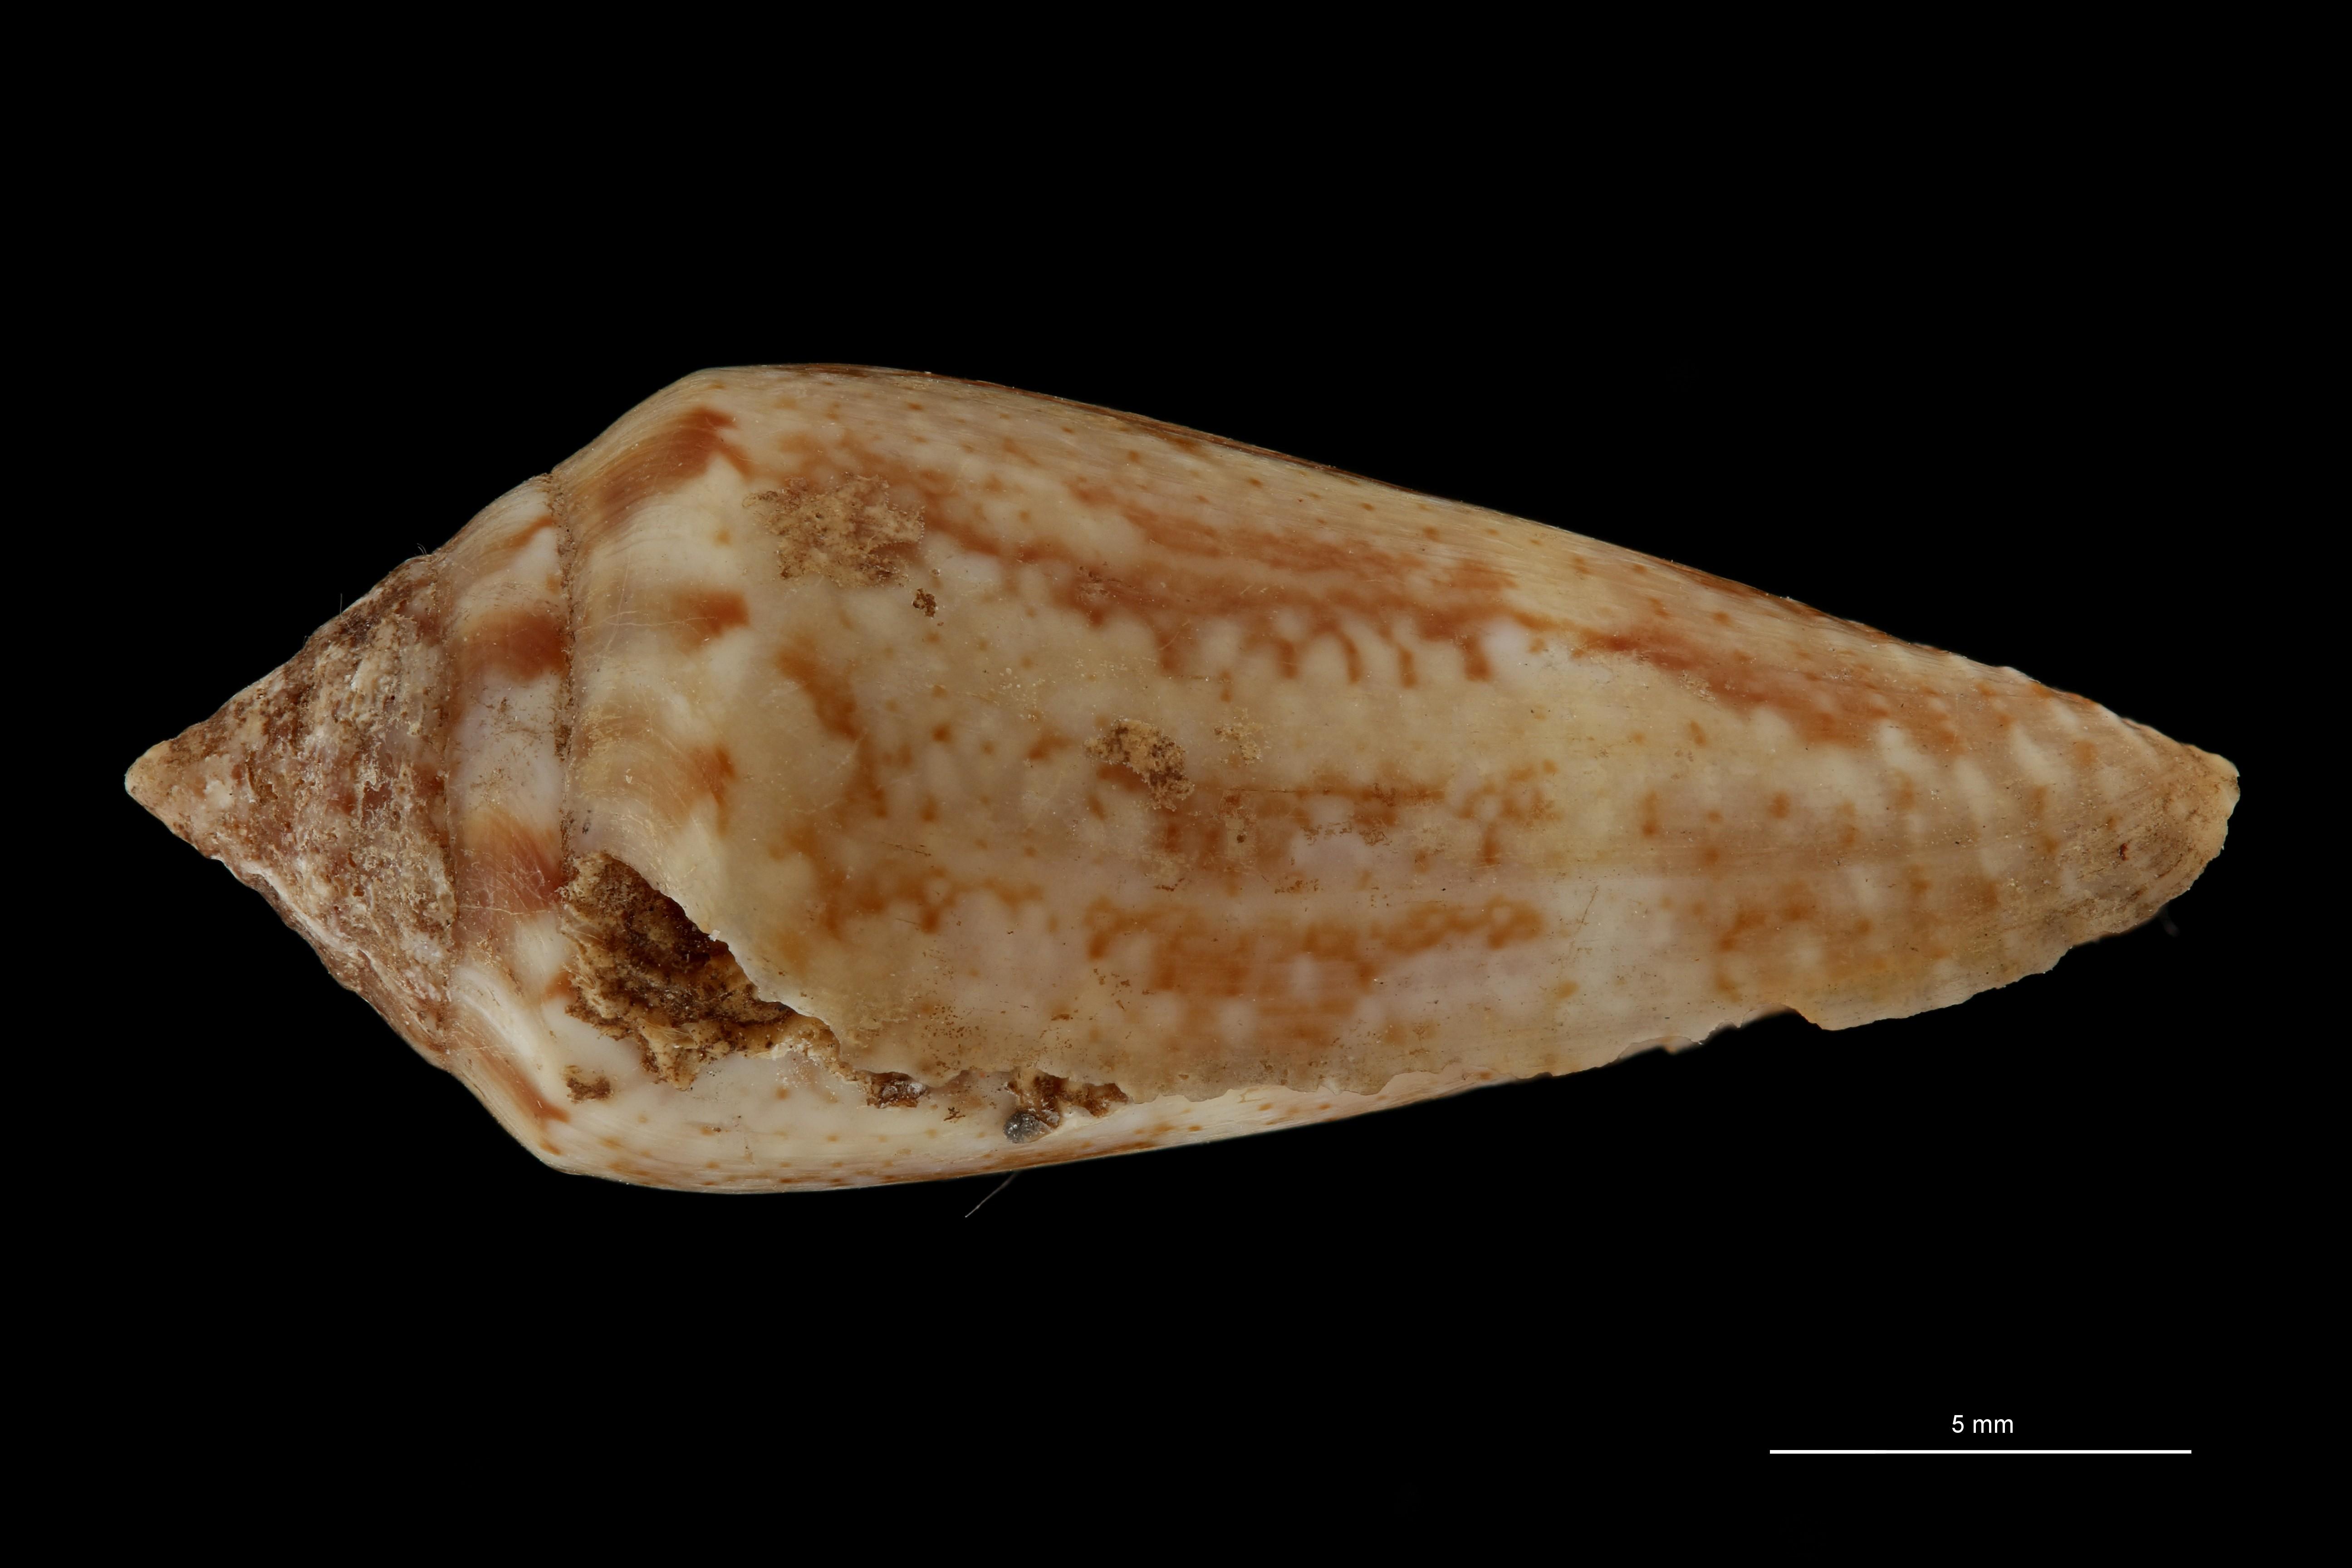 BE-RBINS-INV LECTOTYPE MT 401 Conus mediterraneus elongata LATERAL ZS PMax Scaled.jpg